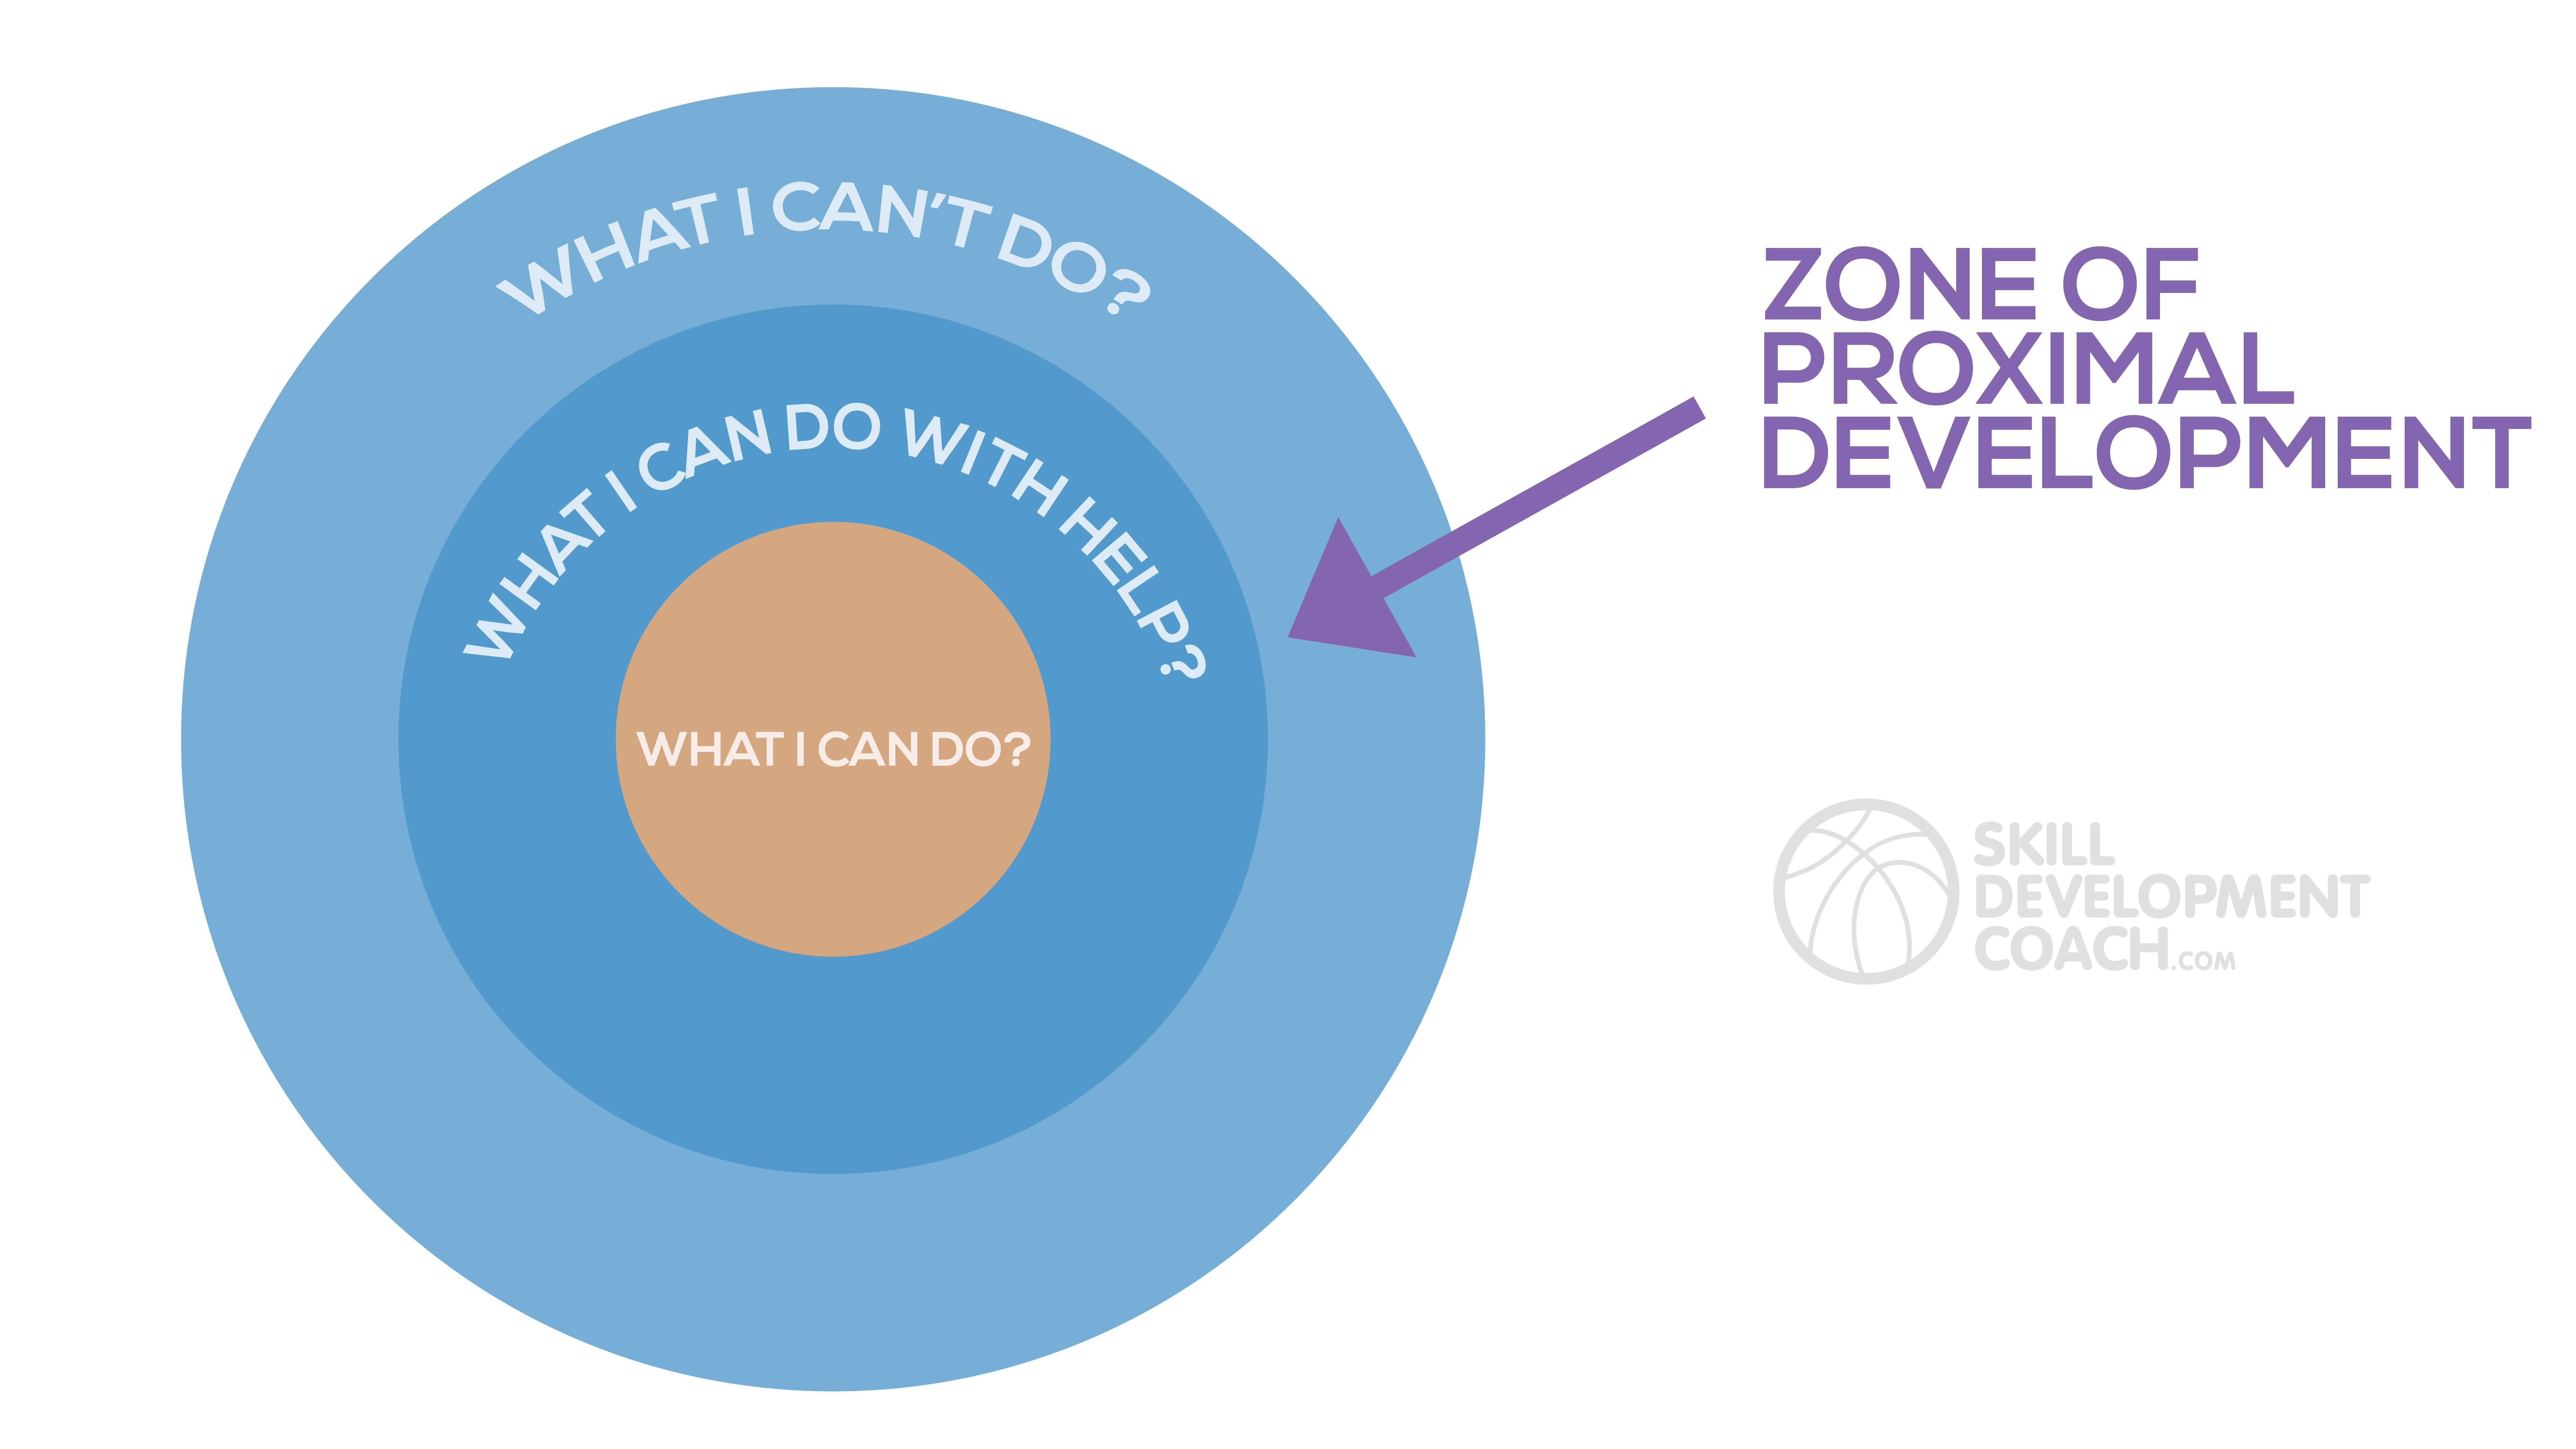 SDC - Zone Of Proximal Development with Logo